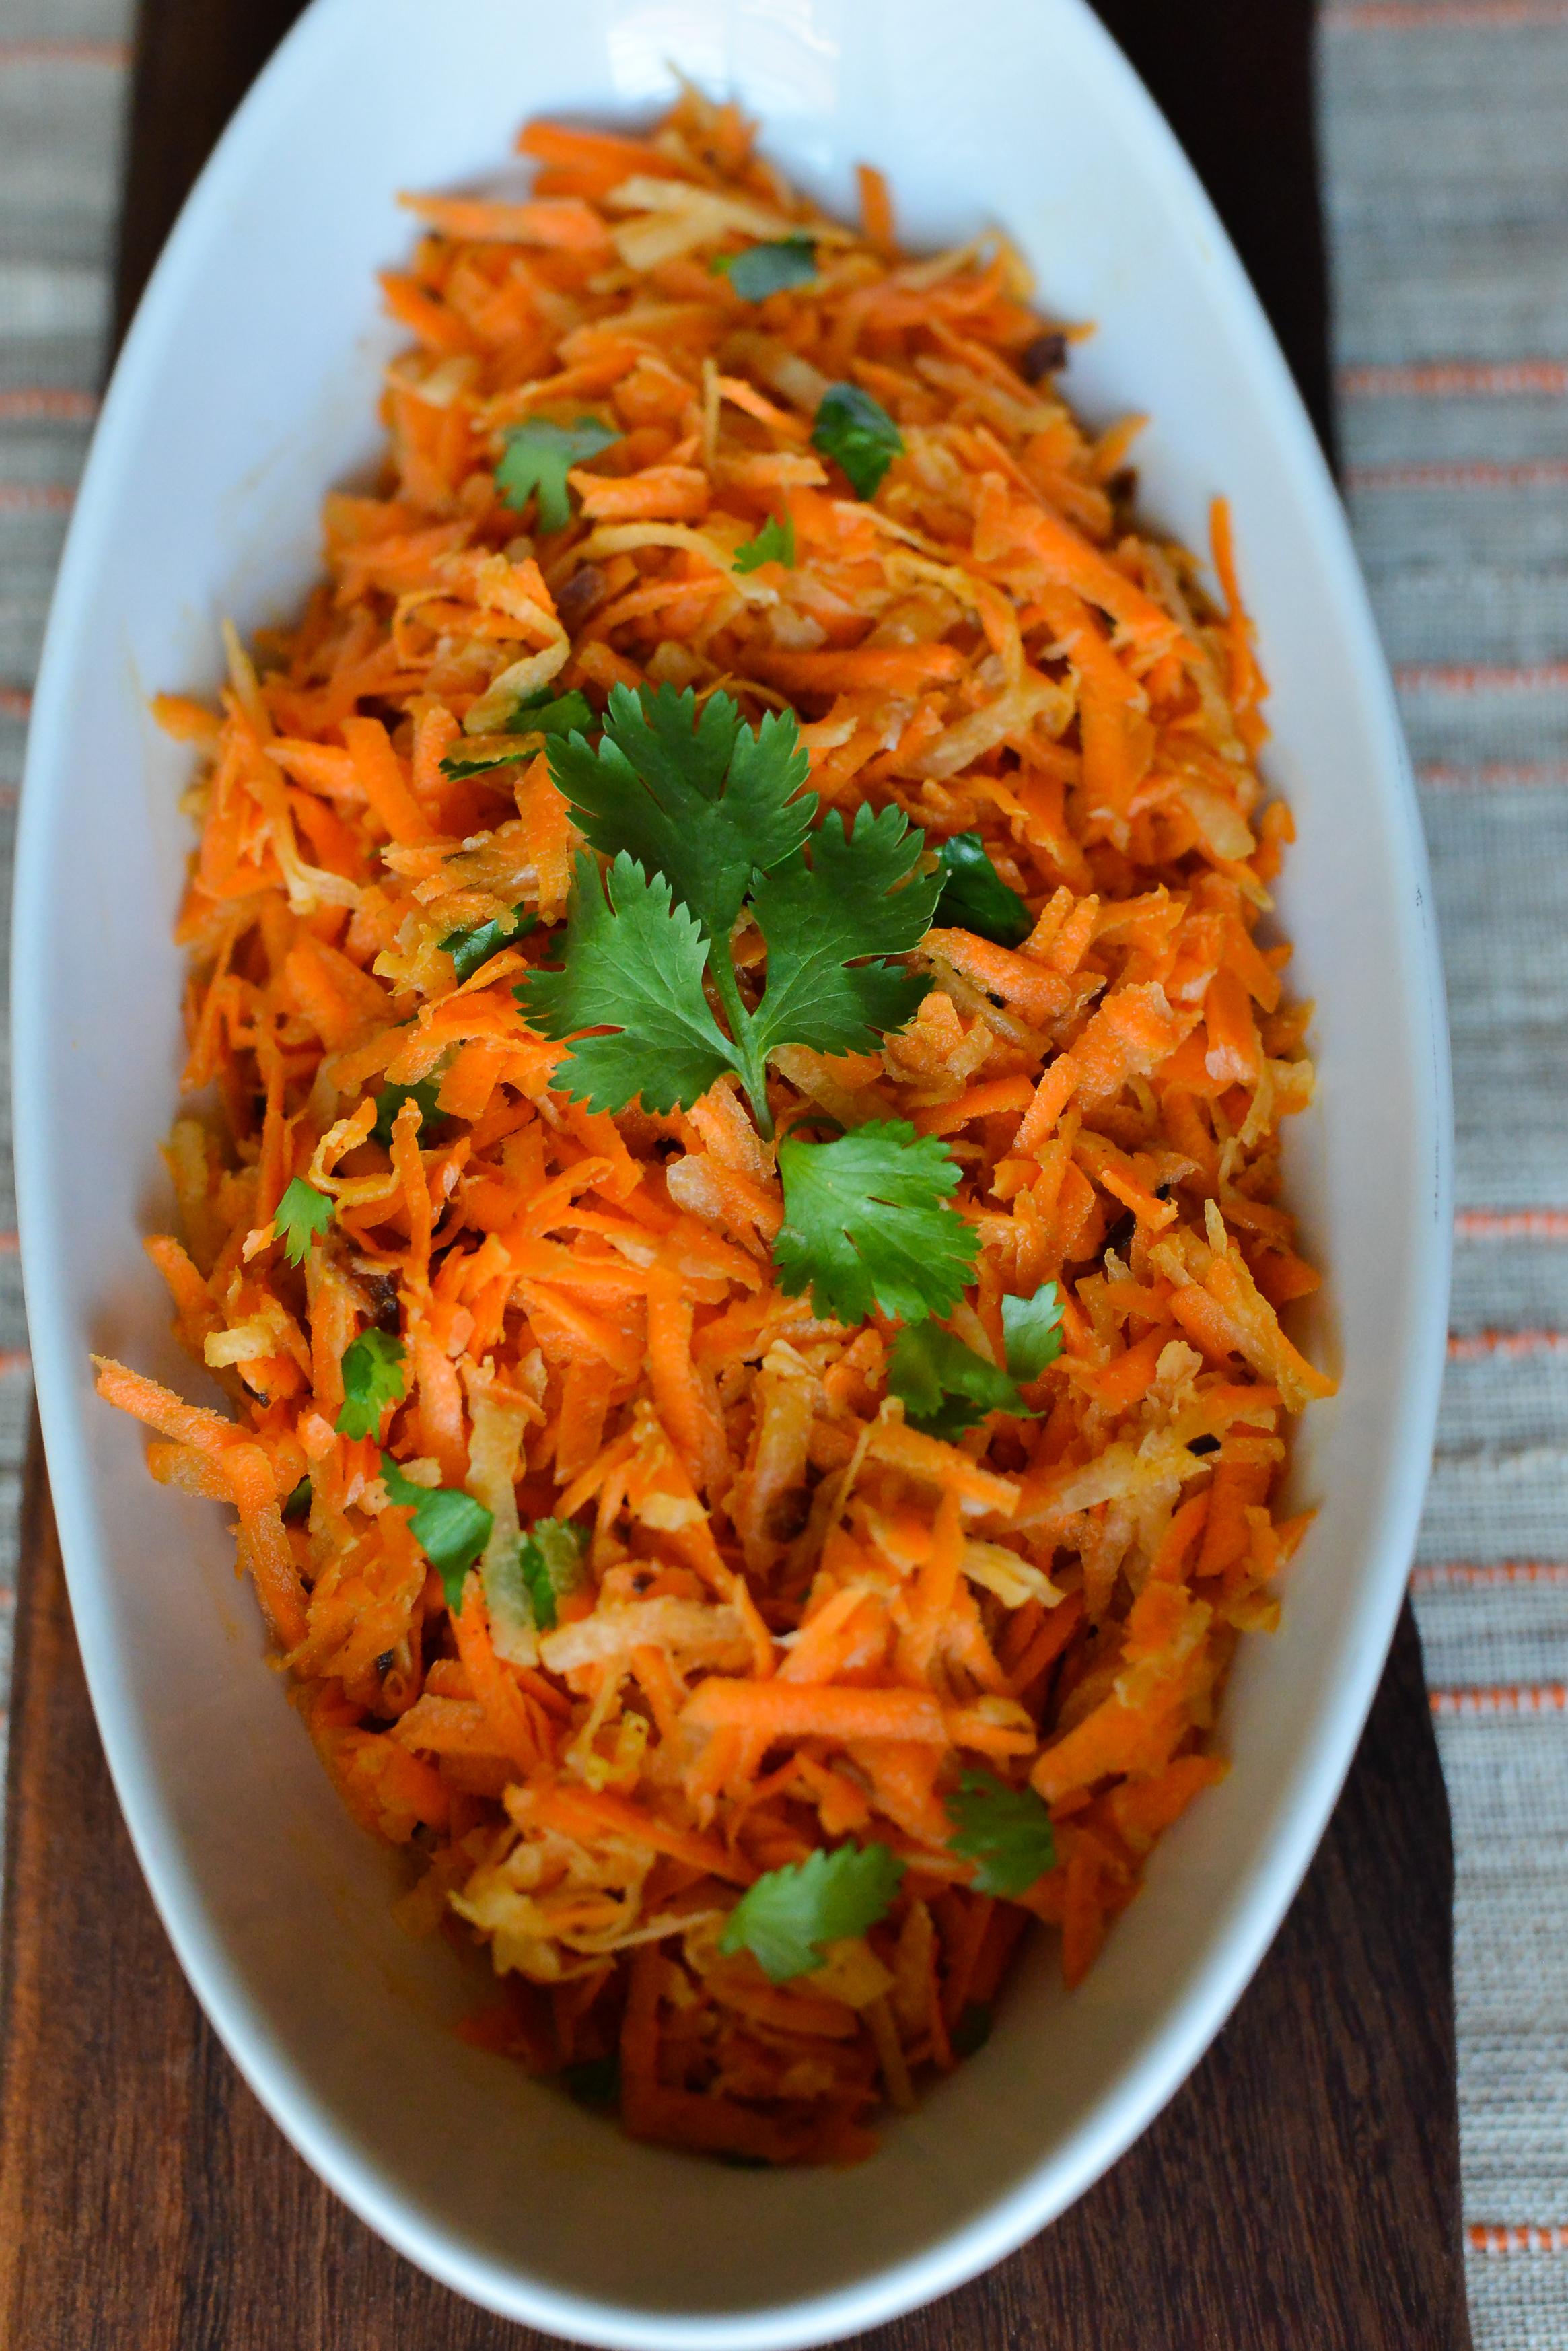 Carrot jicama pics-3.jpg